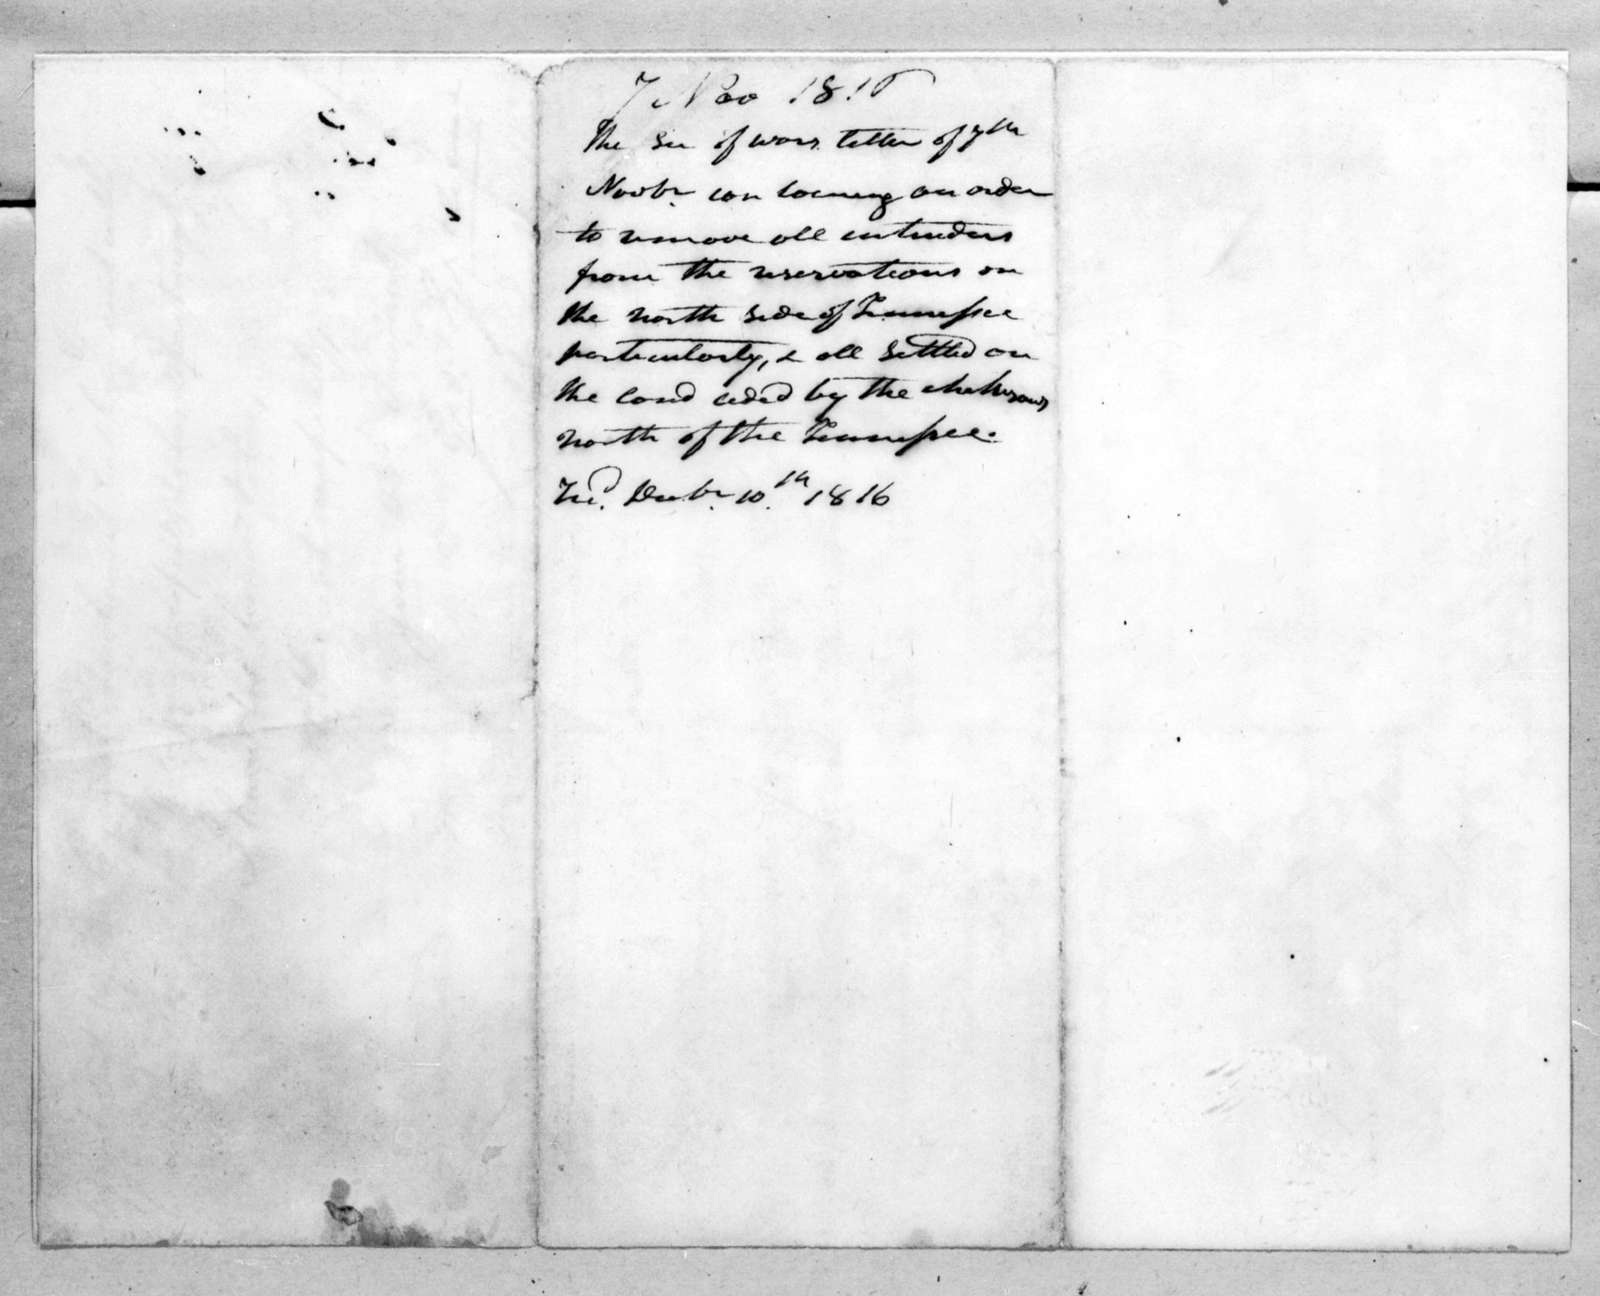 George Graham to Andrew Jackson, November 7, 1816